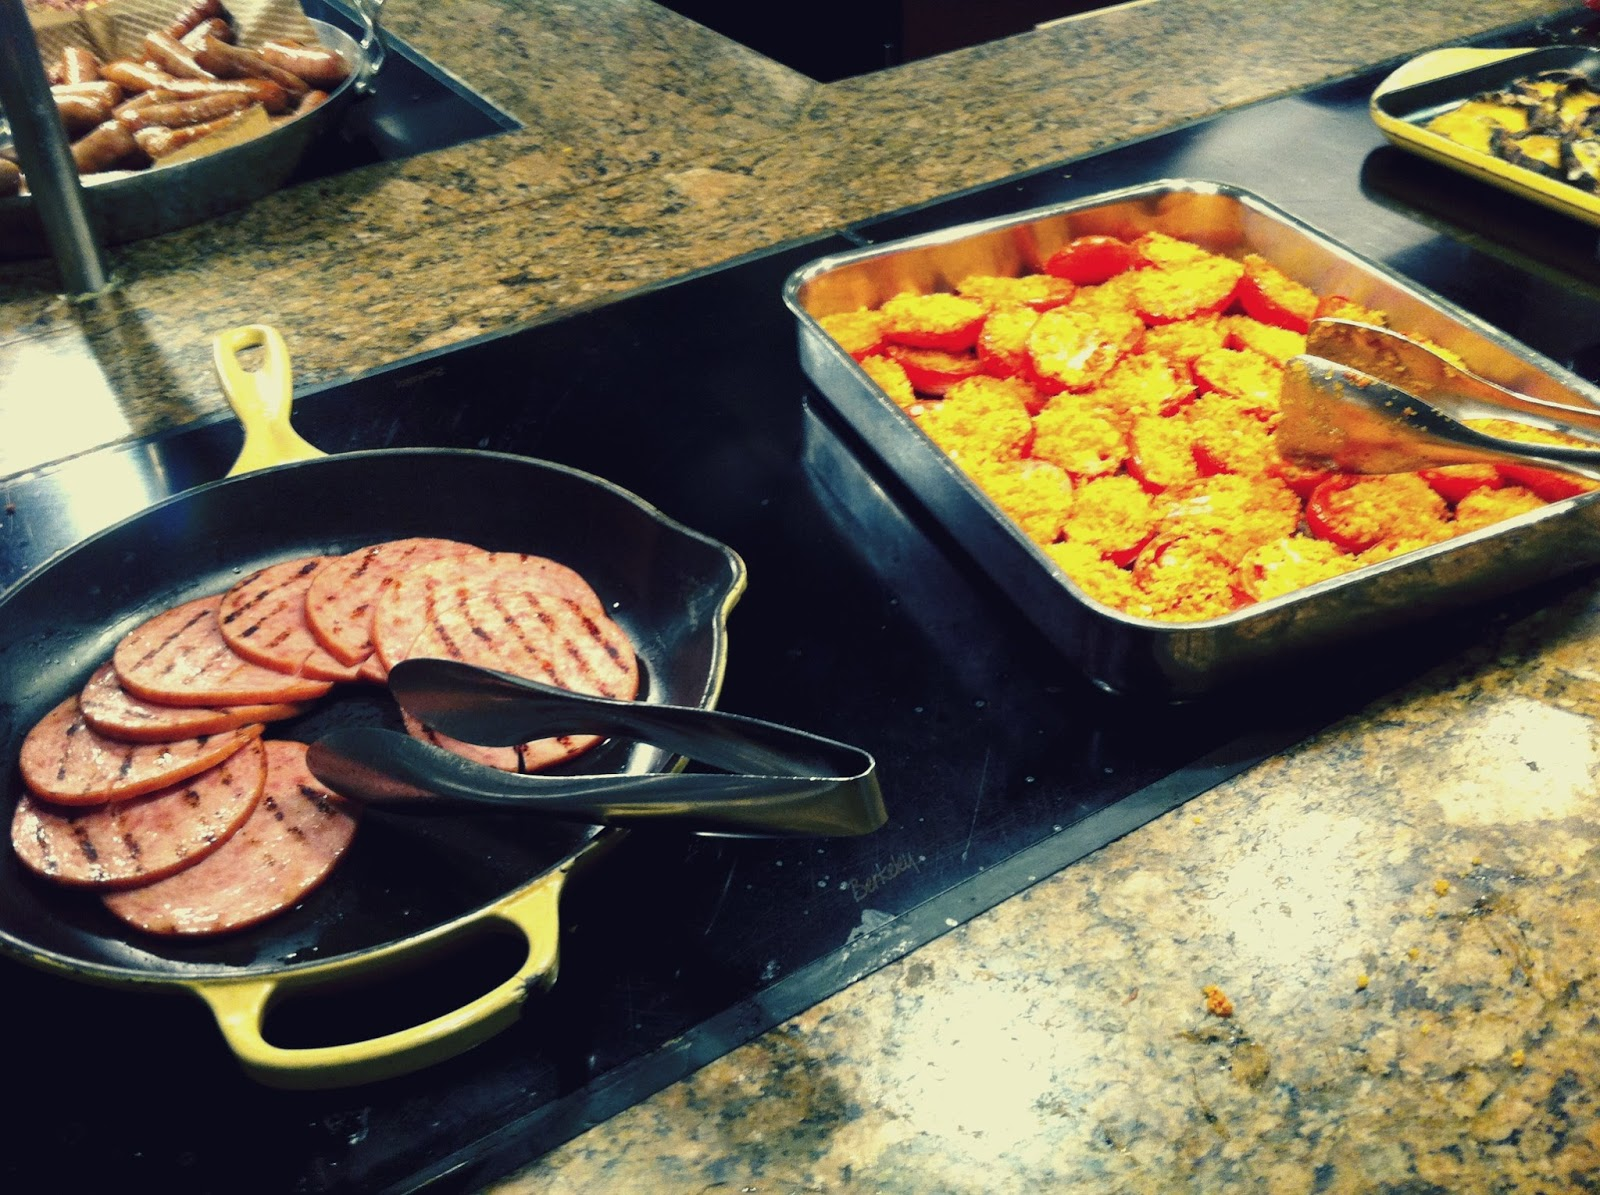 Borgata Breakfast Buffet Menu